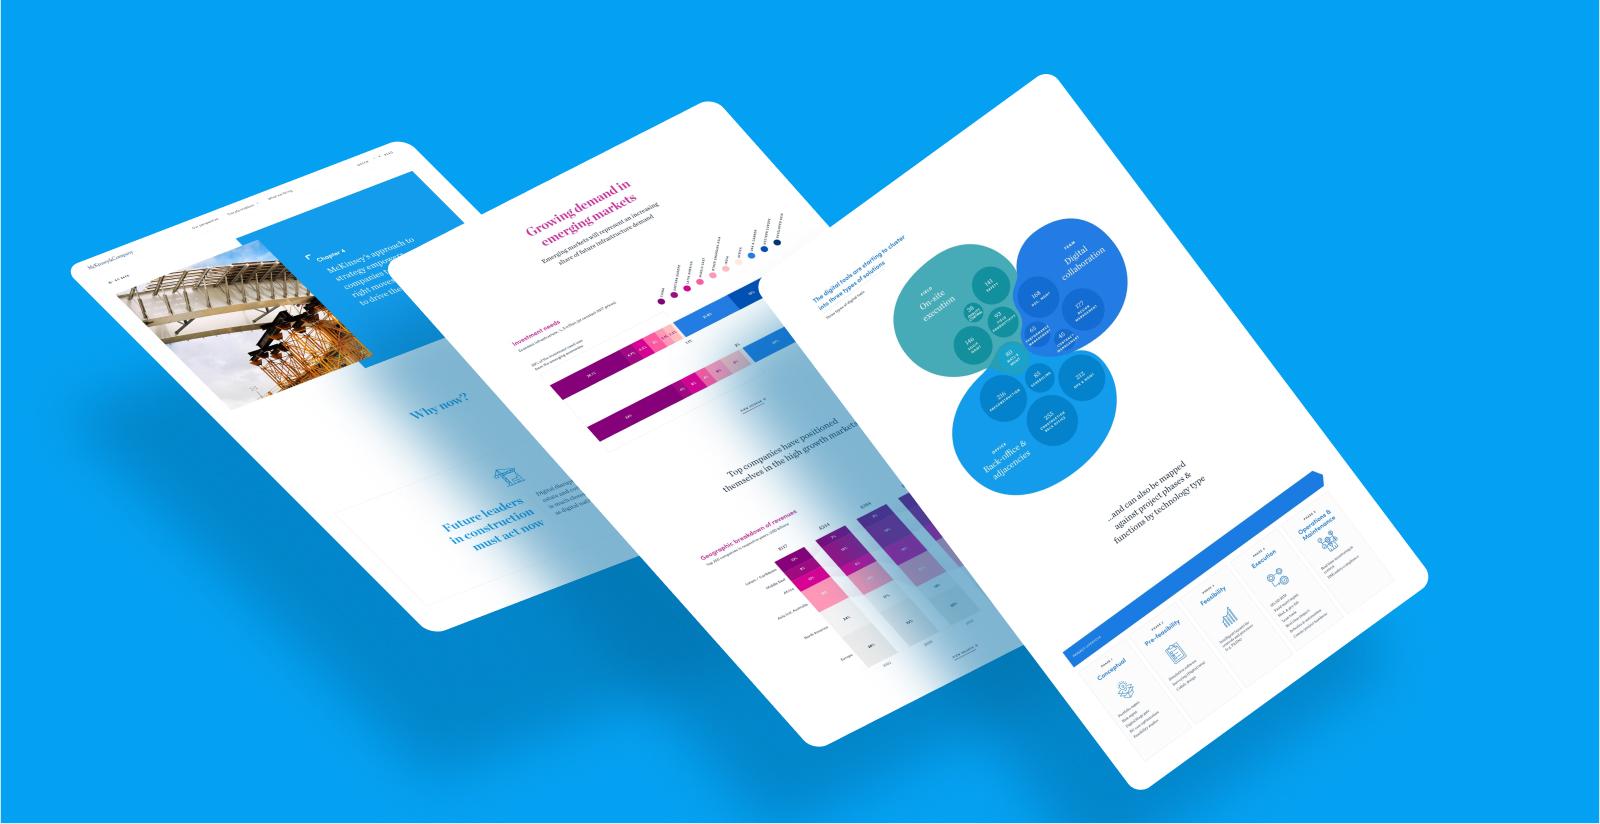 Hero image of UI Digital Design case study for McKinsey